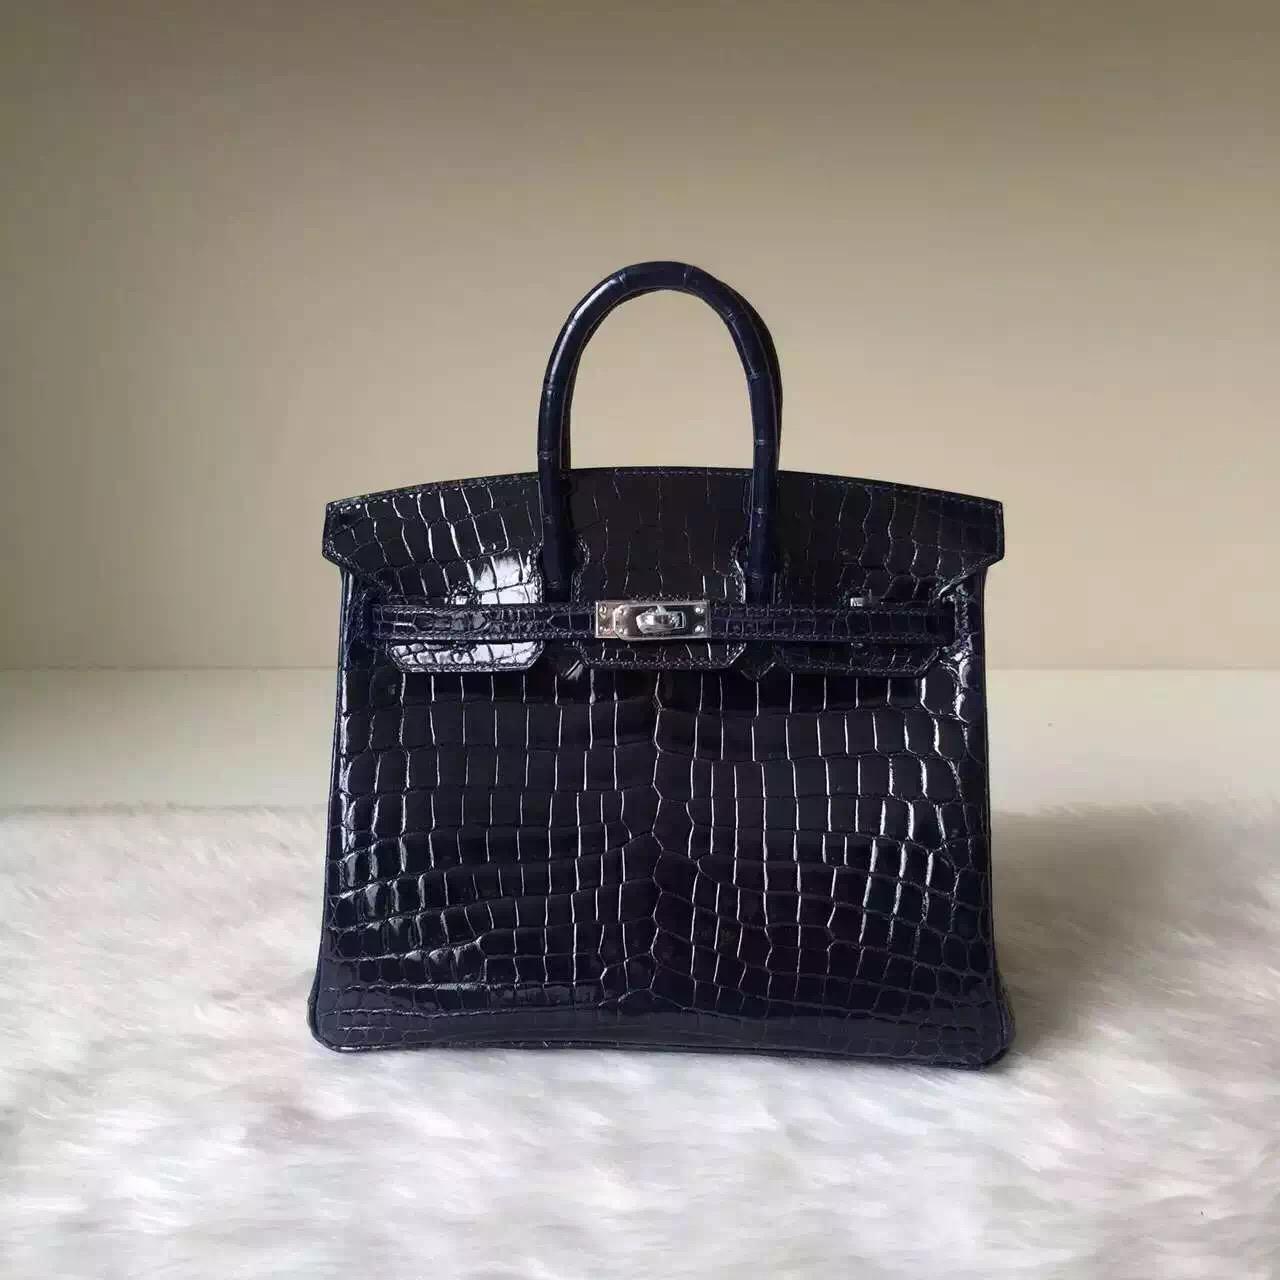 Discount Hermes Birkin25 Bag 7K Dark Blue Shiny Crocodile Leather